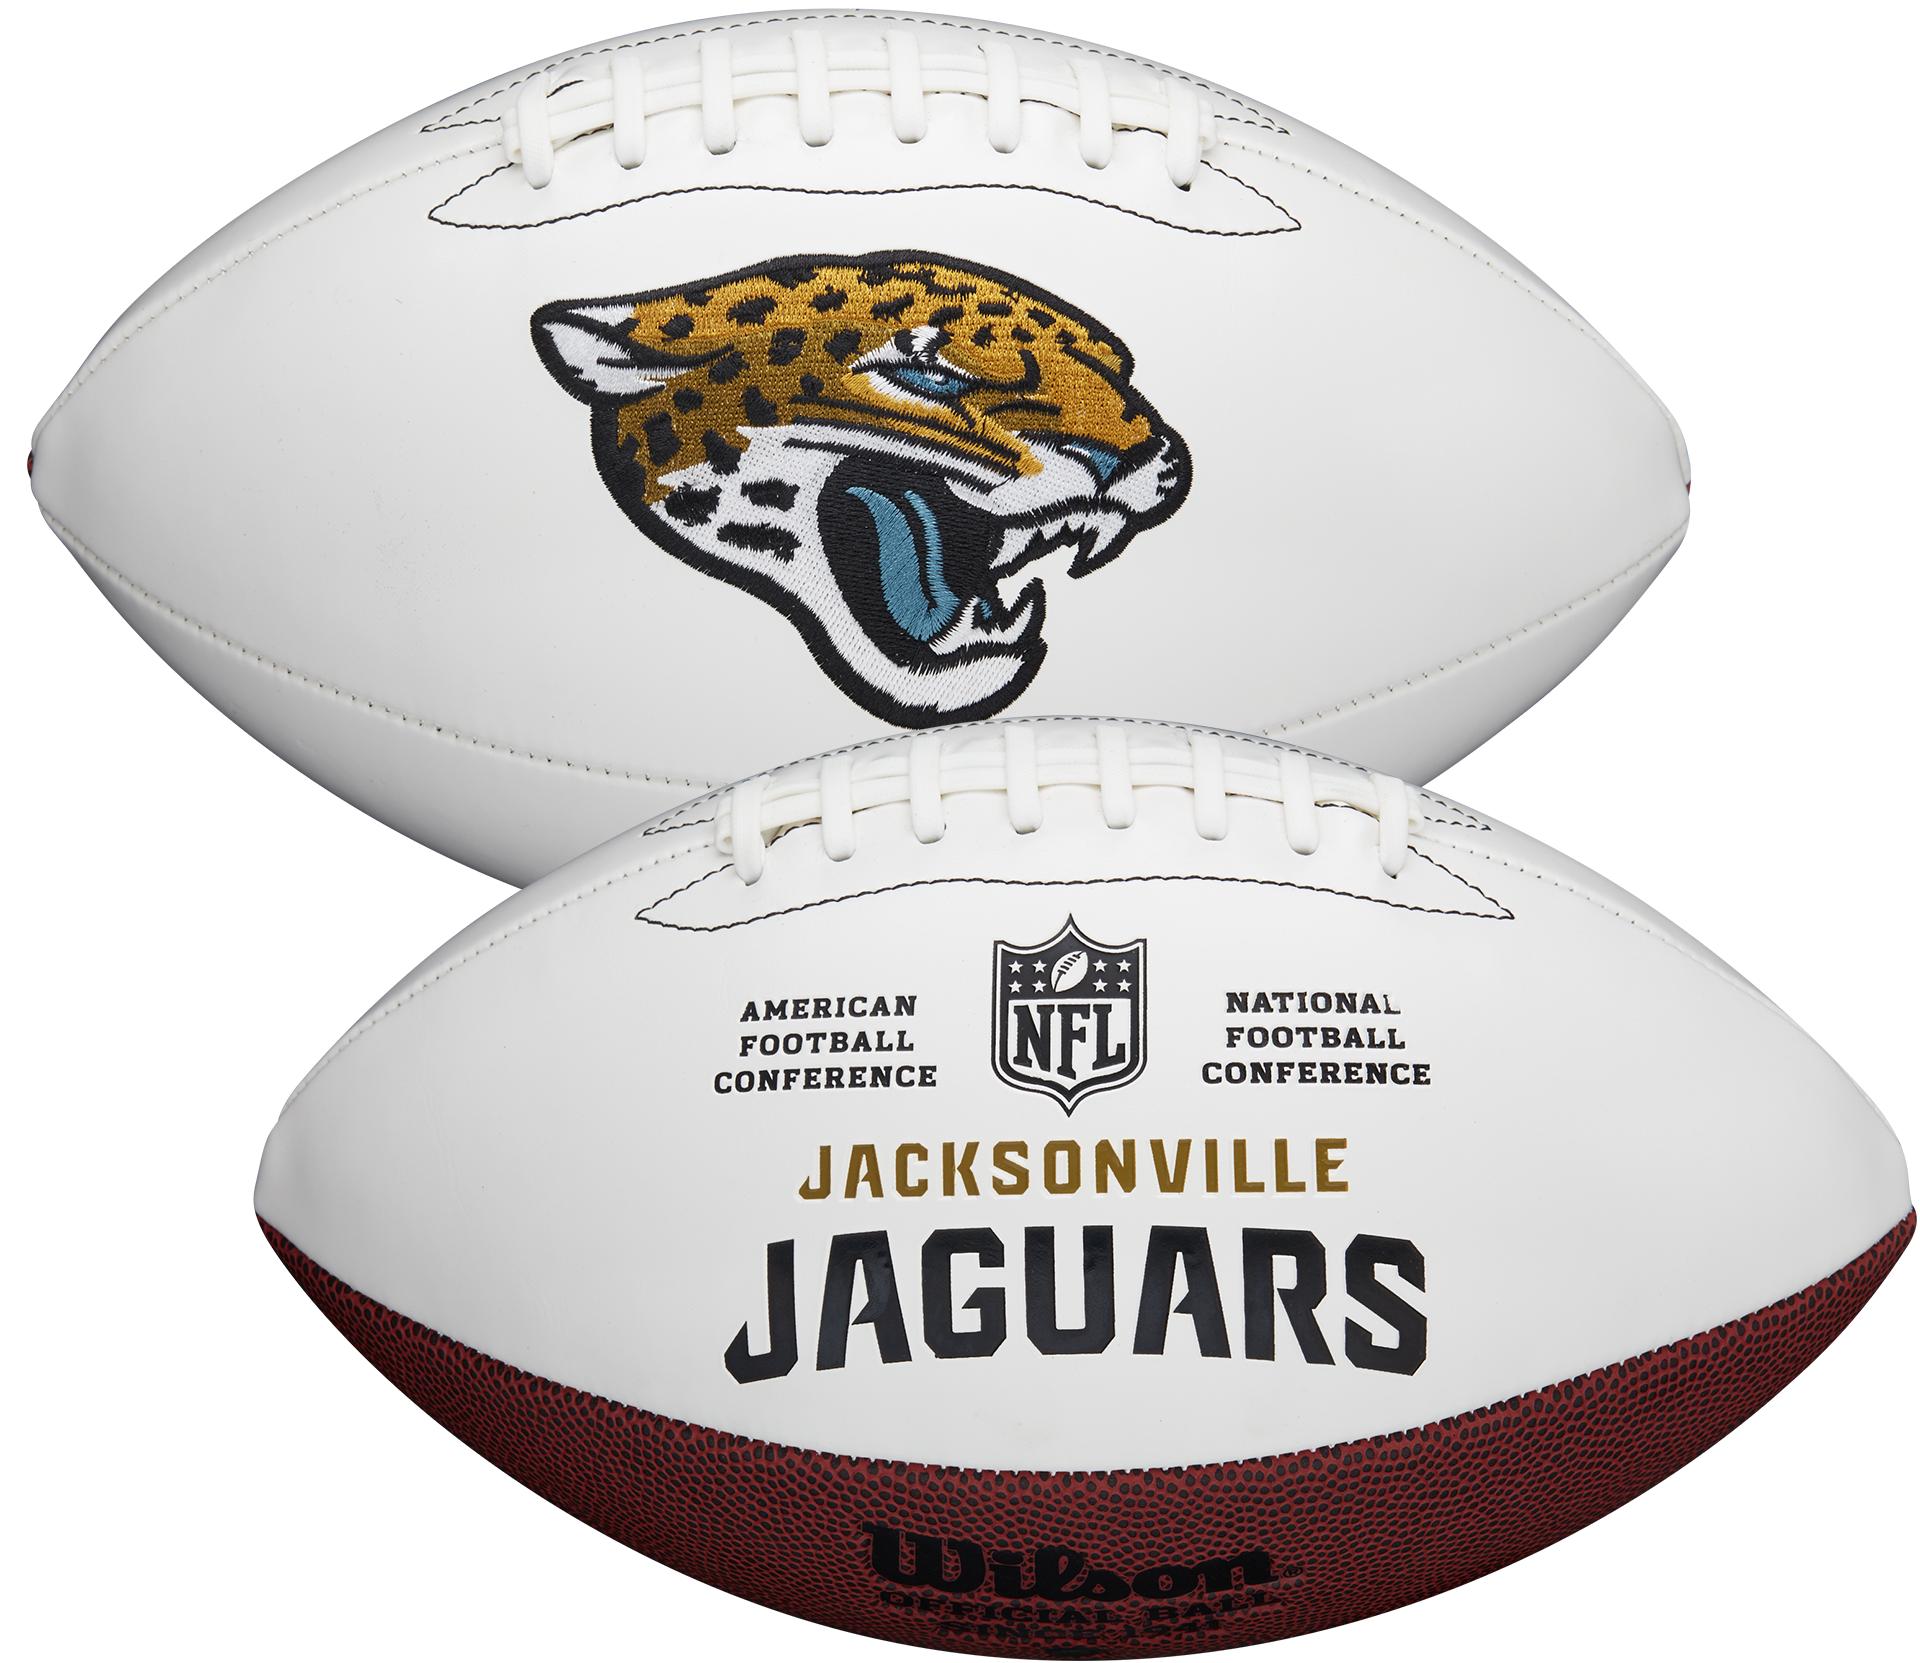 Wilson Jacksonville Jaguars Official NFL Autograph Series Football